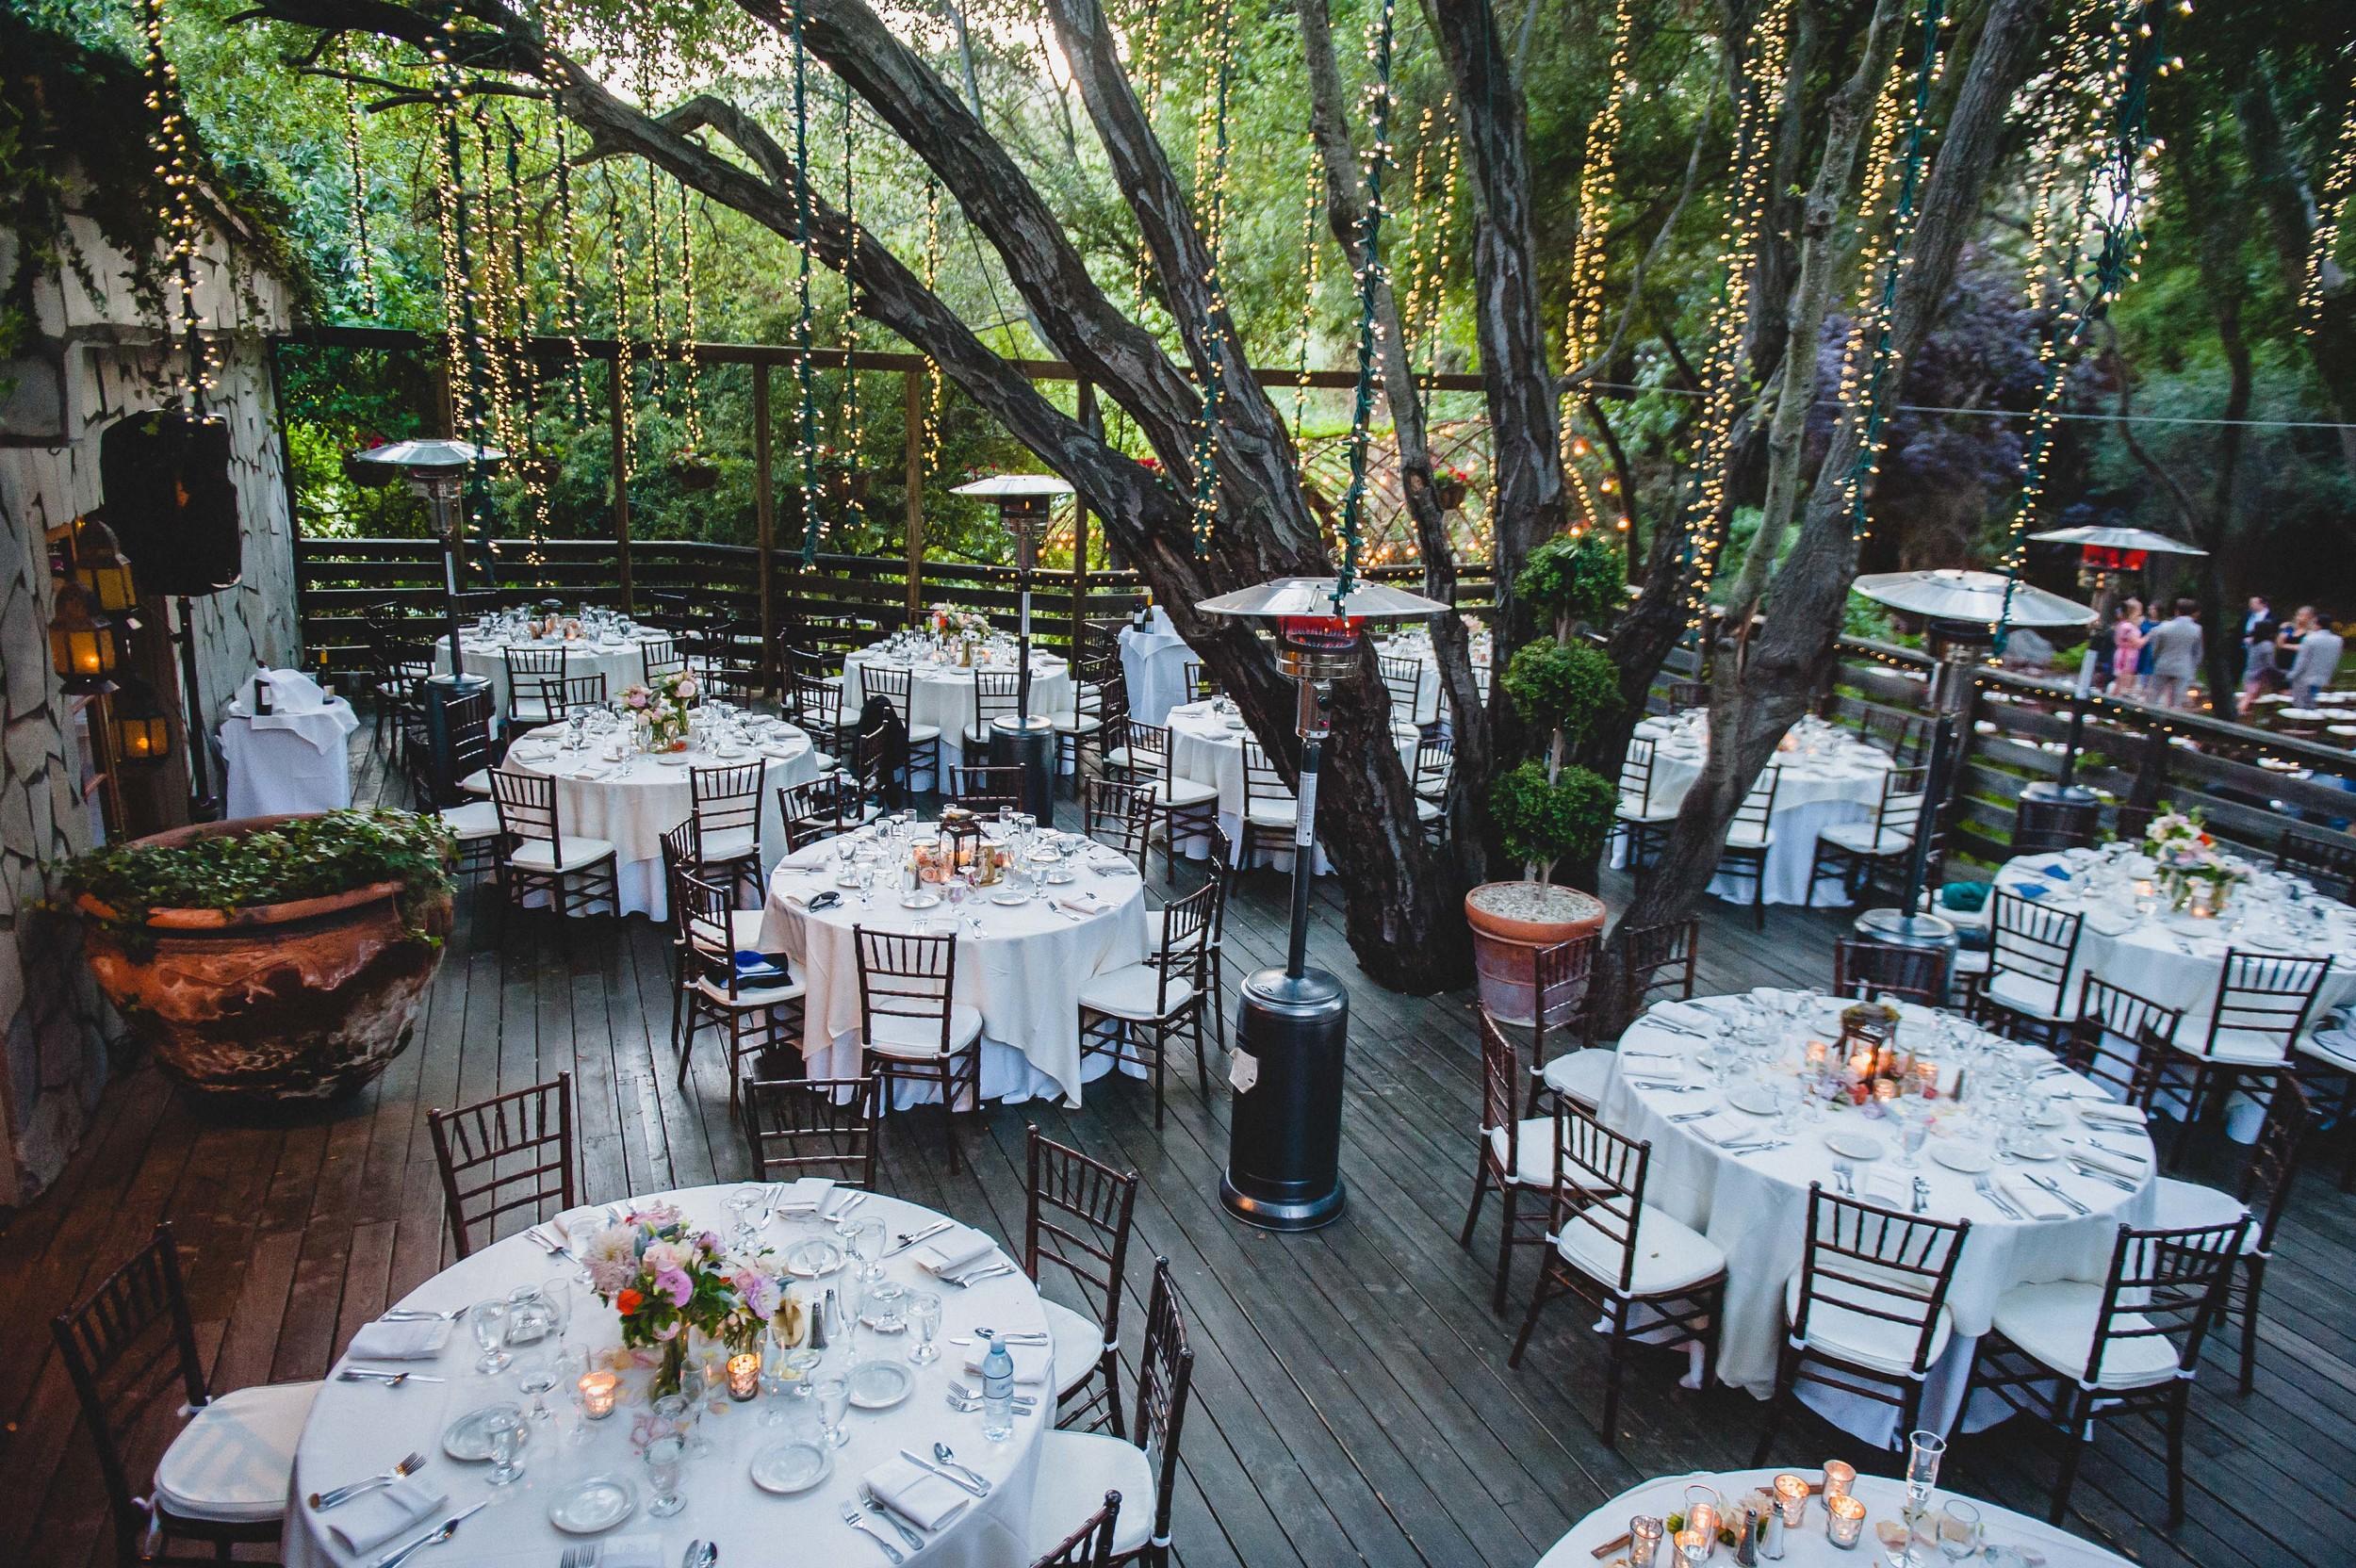 los angeles malibe cafe calamigos ranch destination wedding phtoographer edward lai